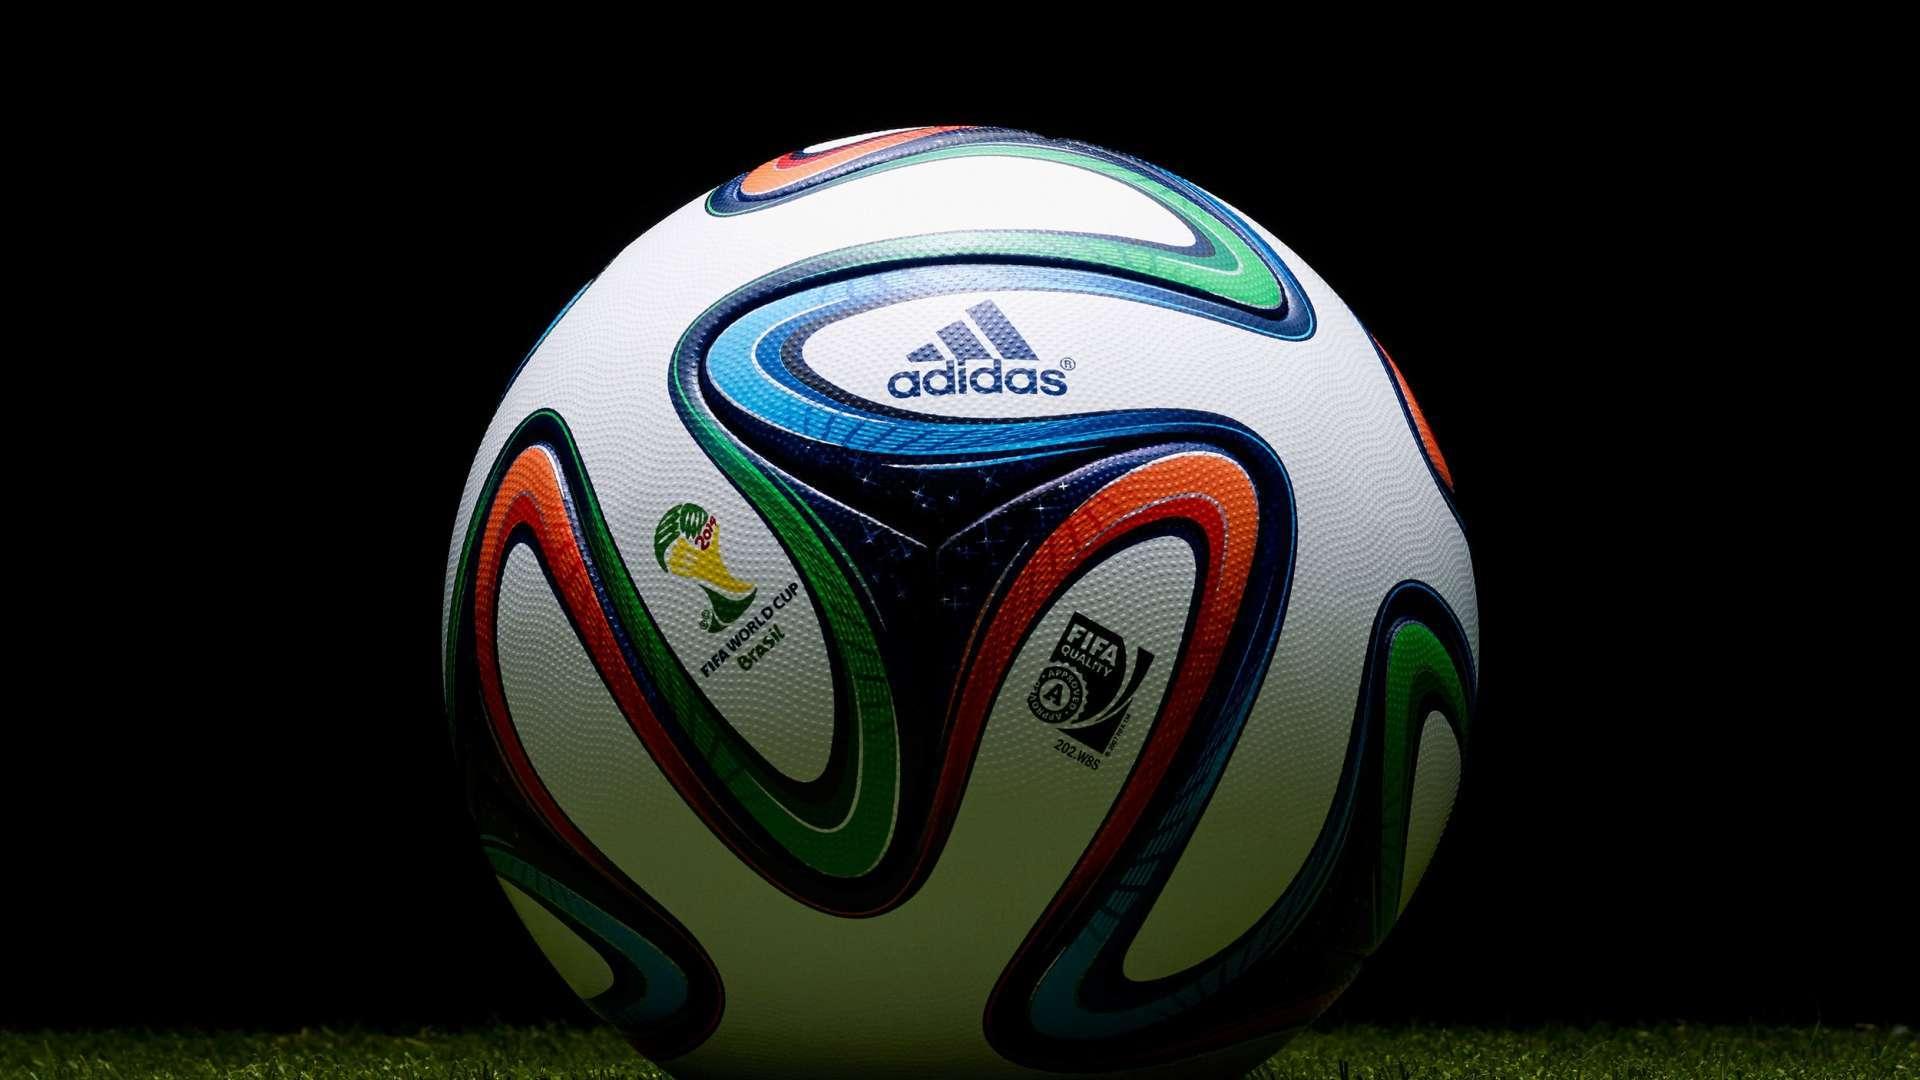 World Cup Adidas Ball Football Hd Wallpaper 1080p HDWallWidecom 1920x1080